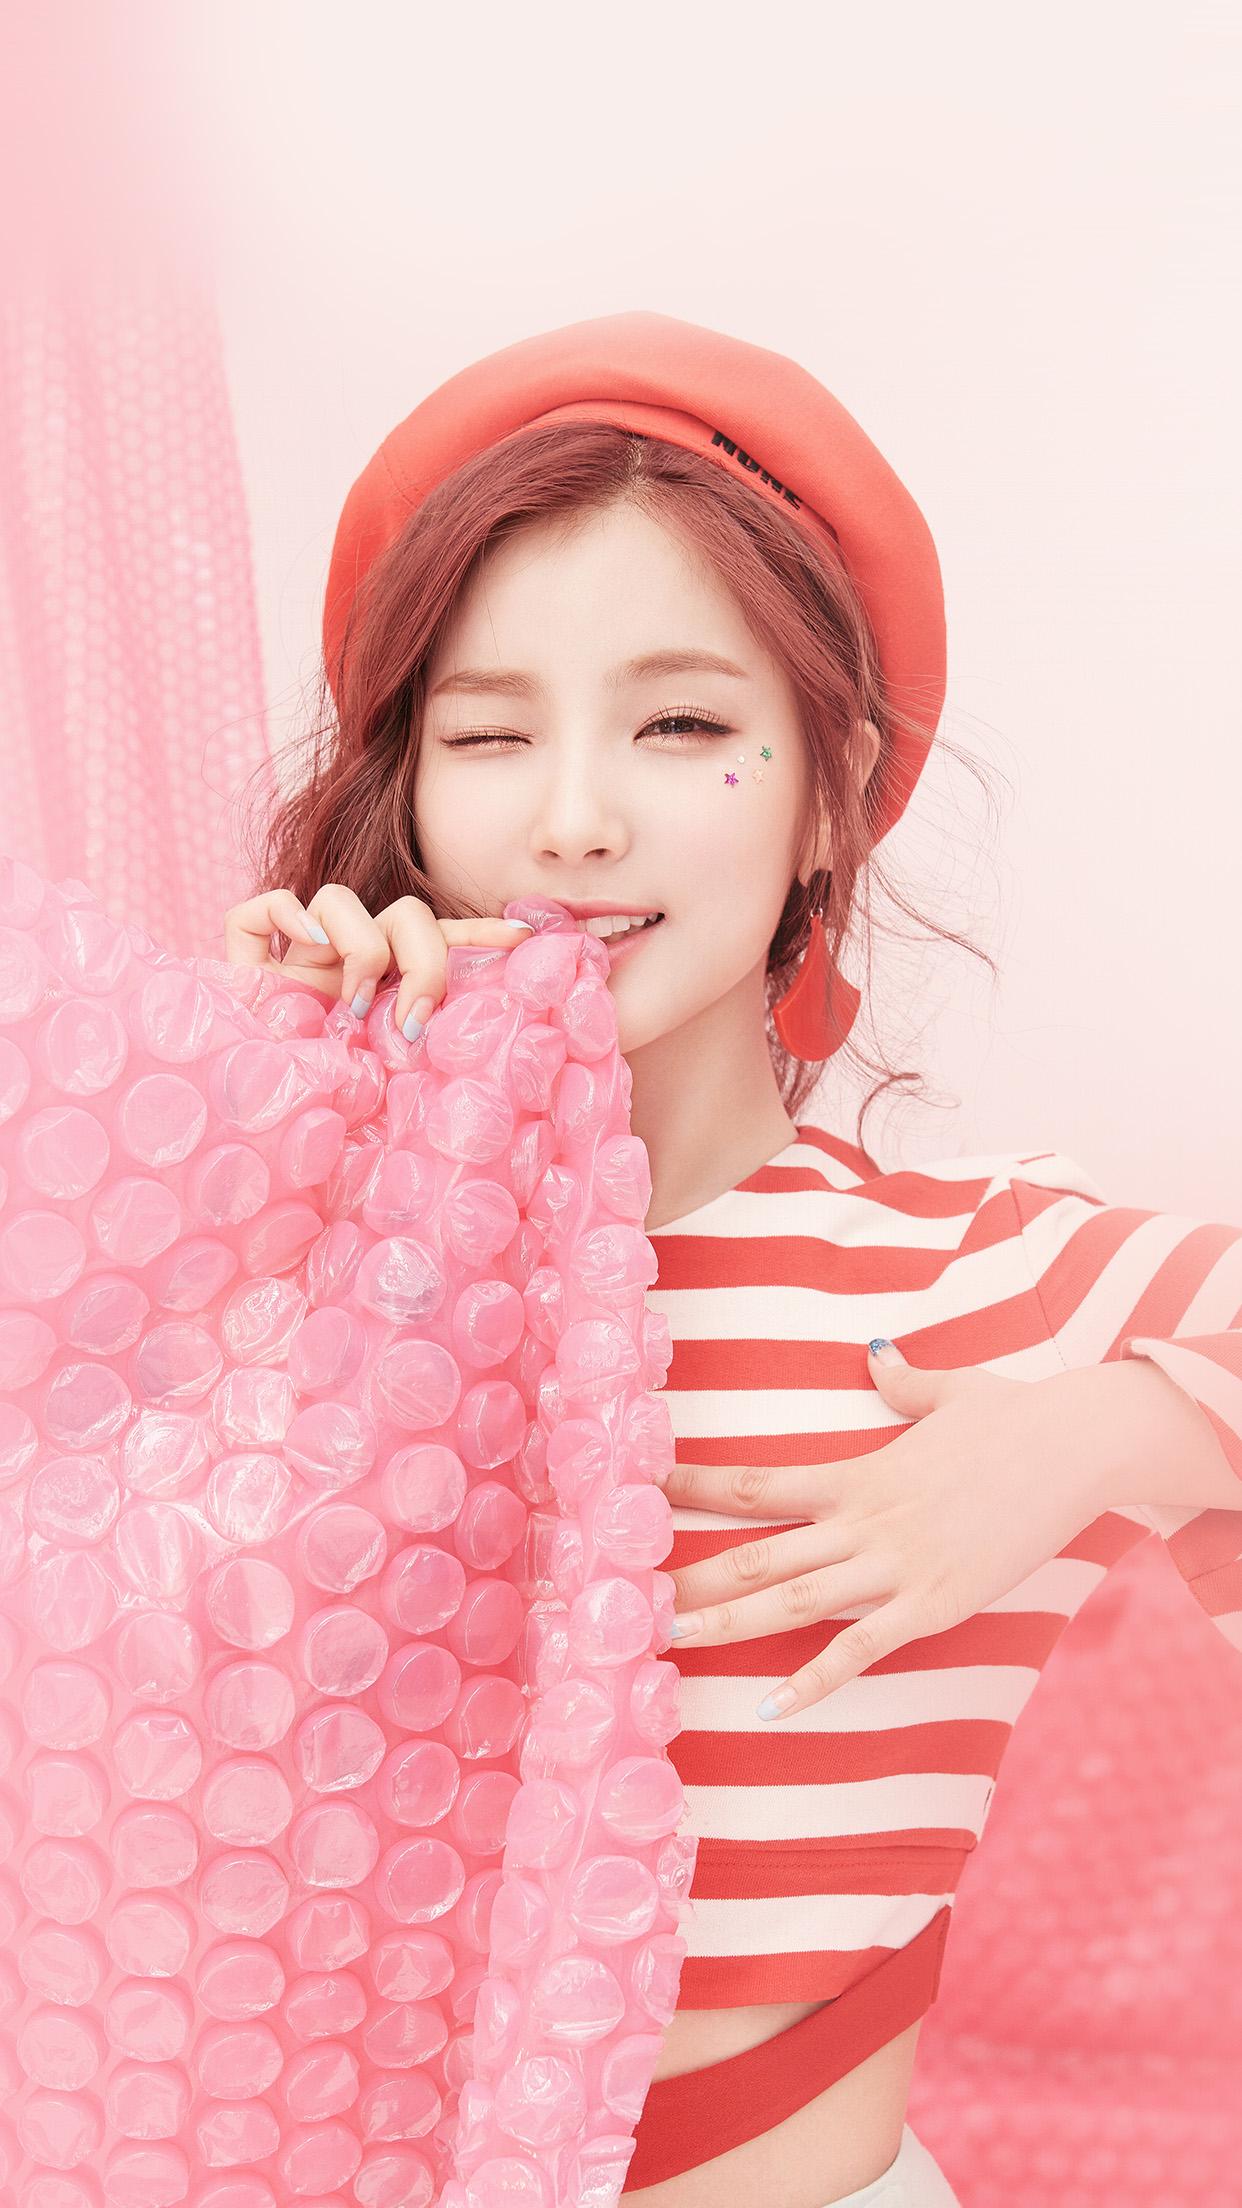 Pastel Pink Wallpaper Cute Ho25 Pink Asian Girl Cute Kpop Wallpaper